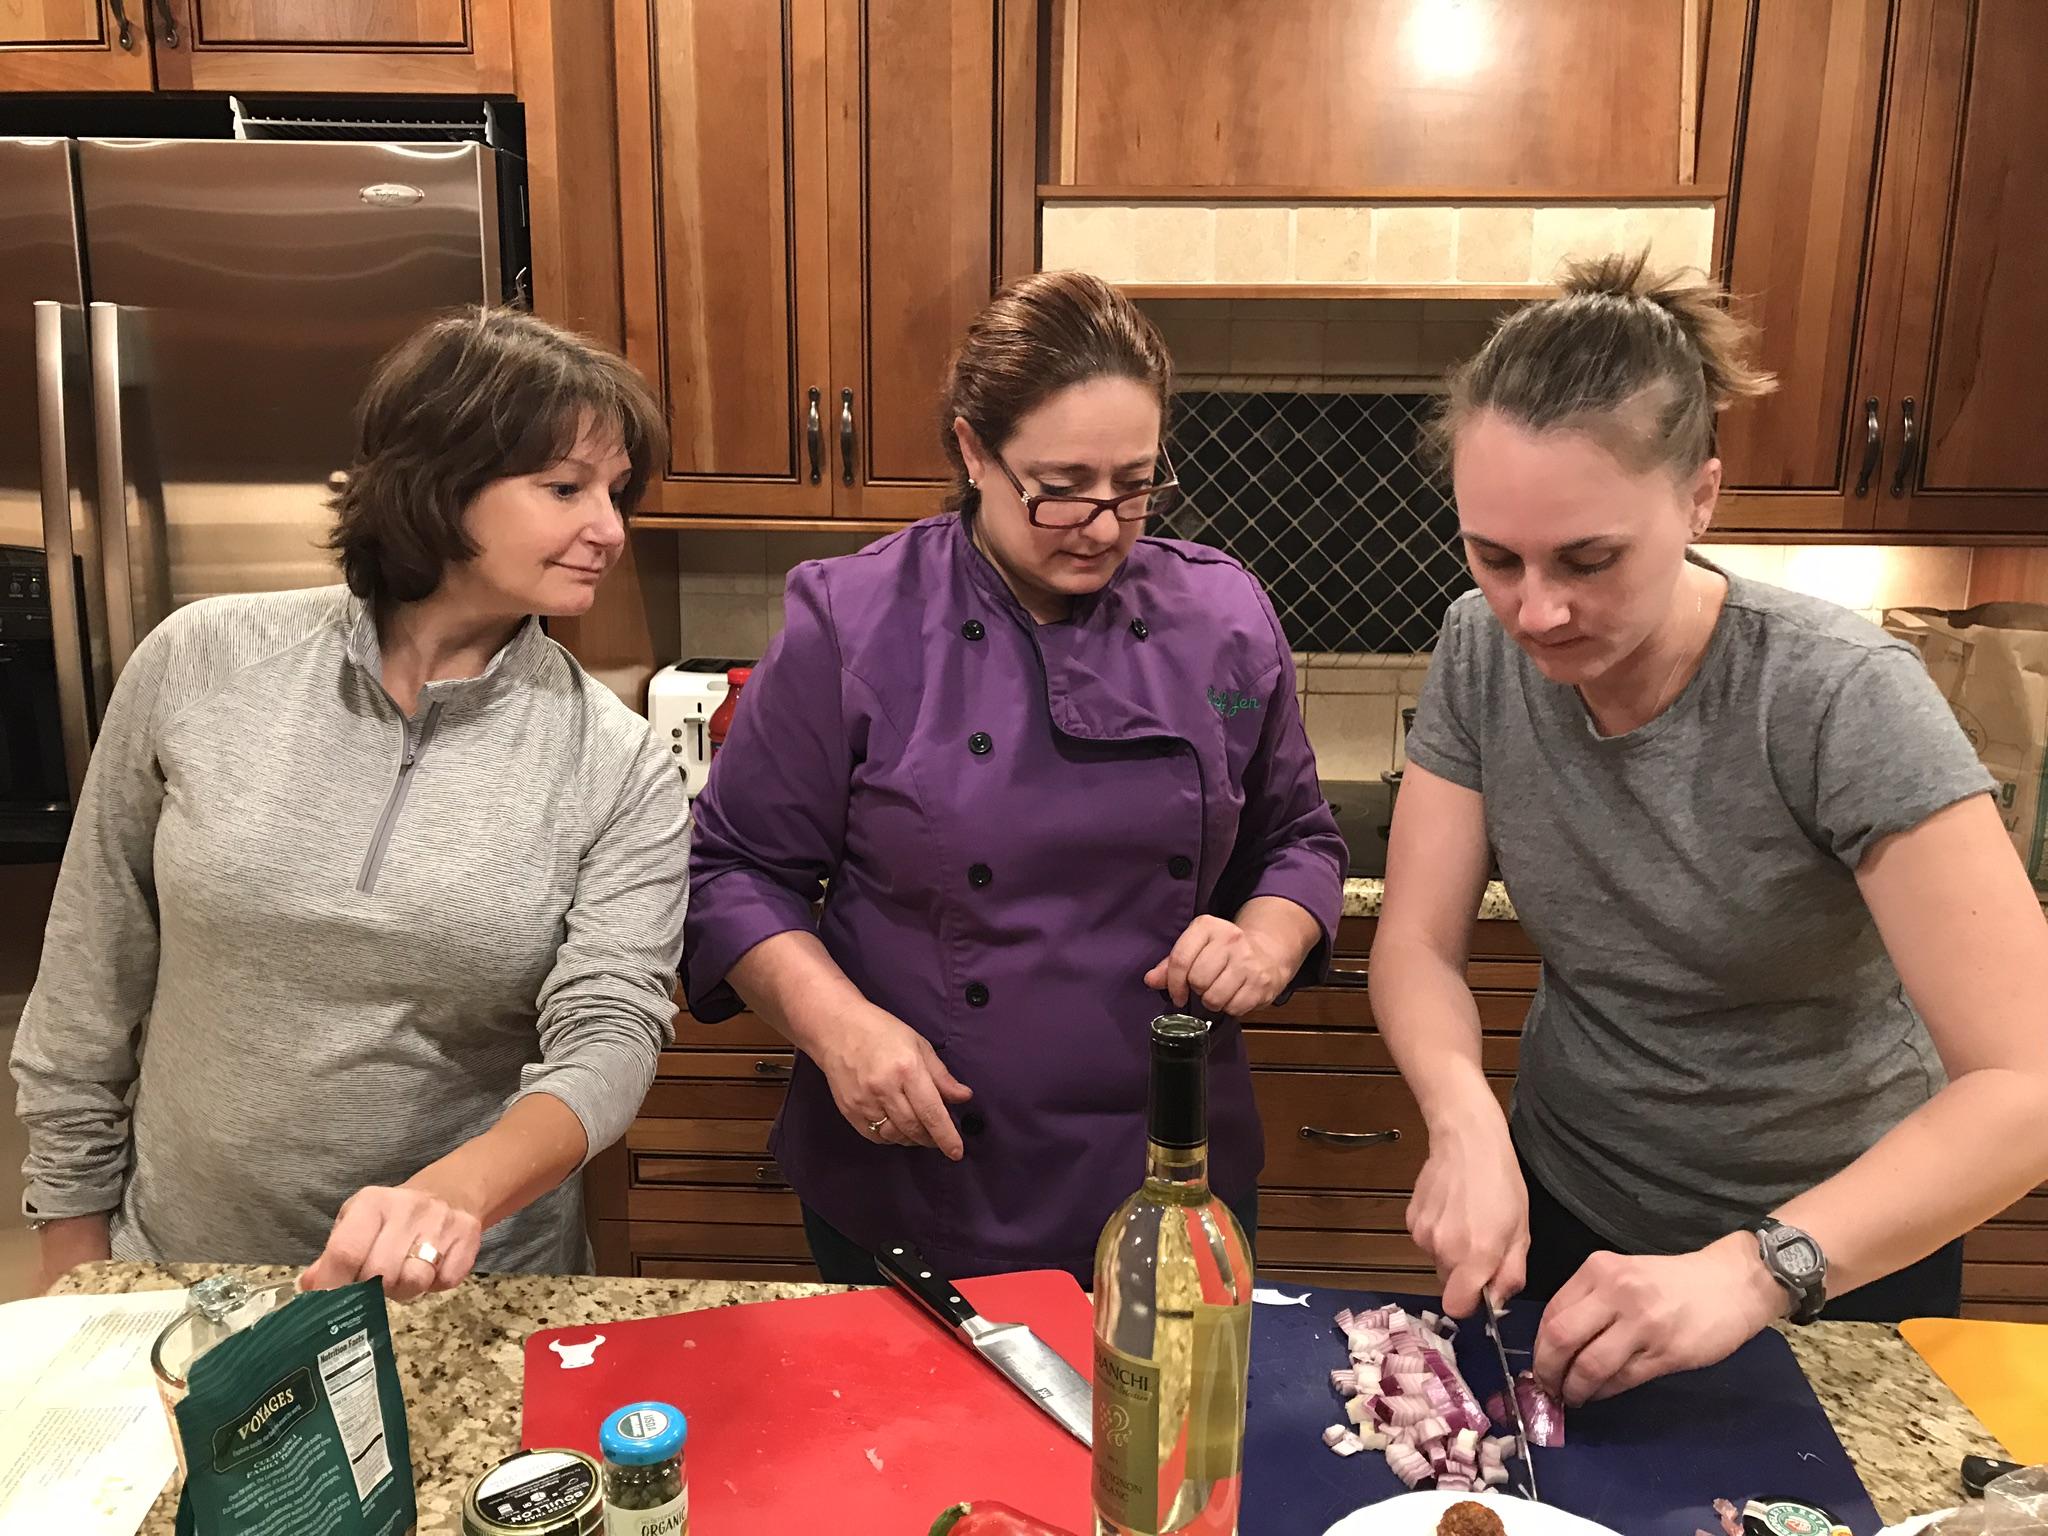 reb jennifer sandrina cutting onion.jpeg